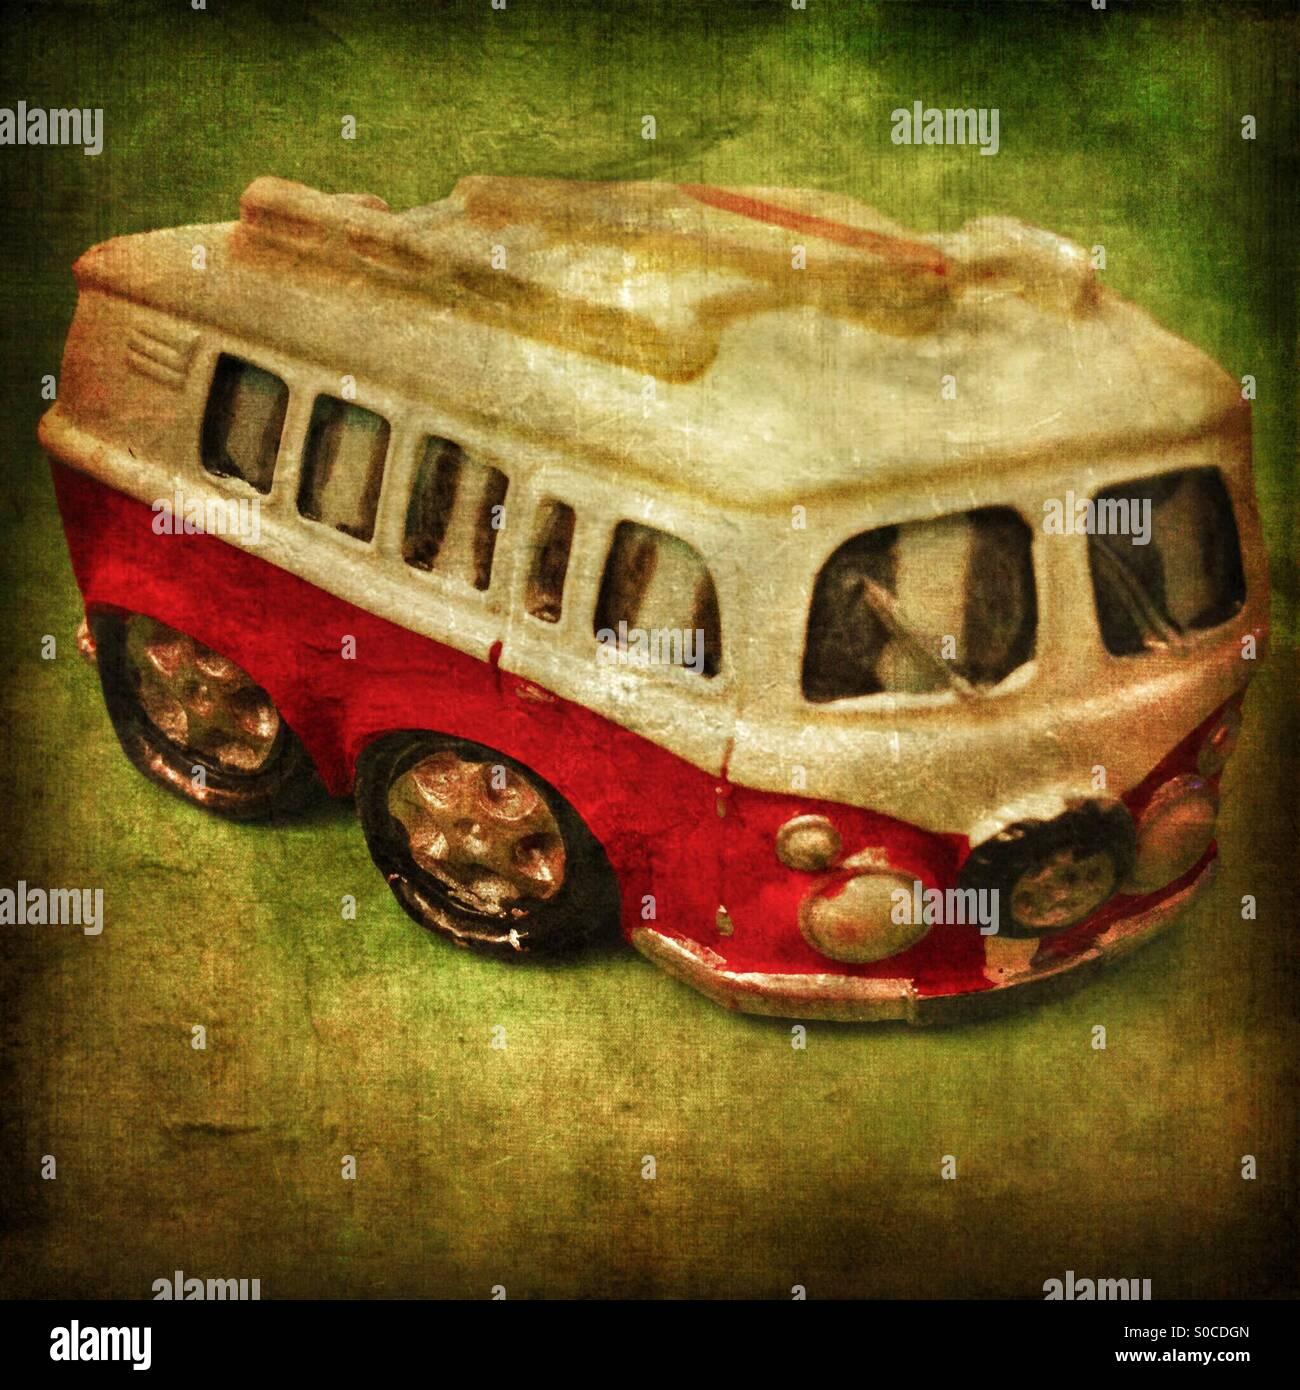 VW van fridge magnet - Stock Image